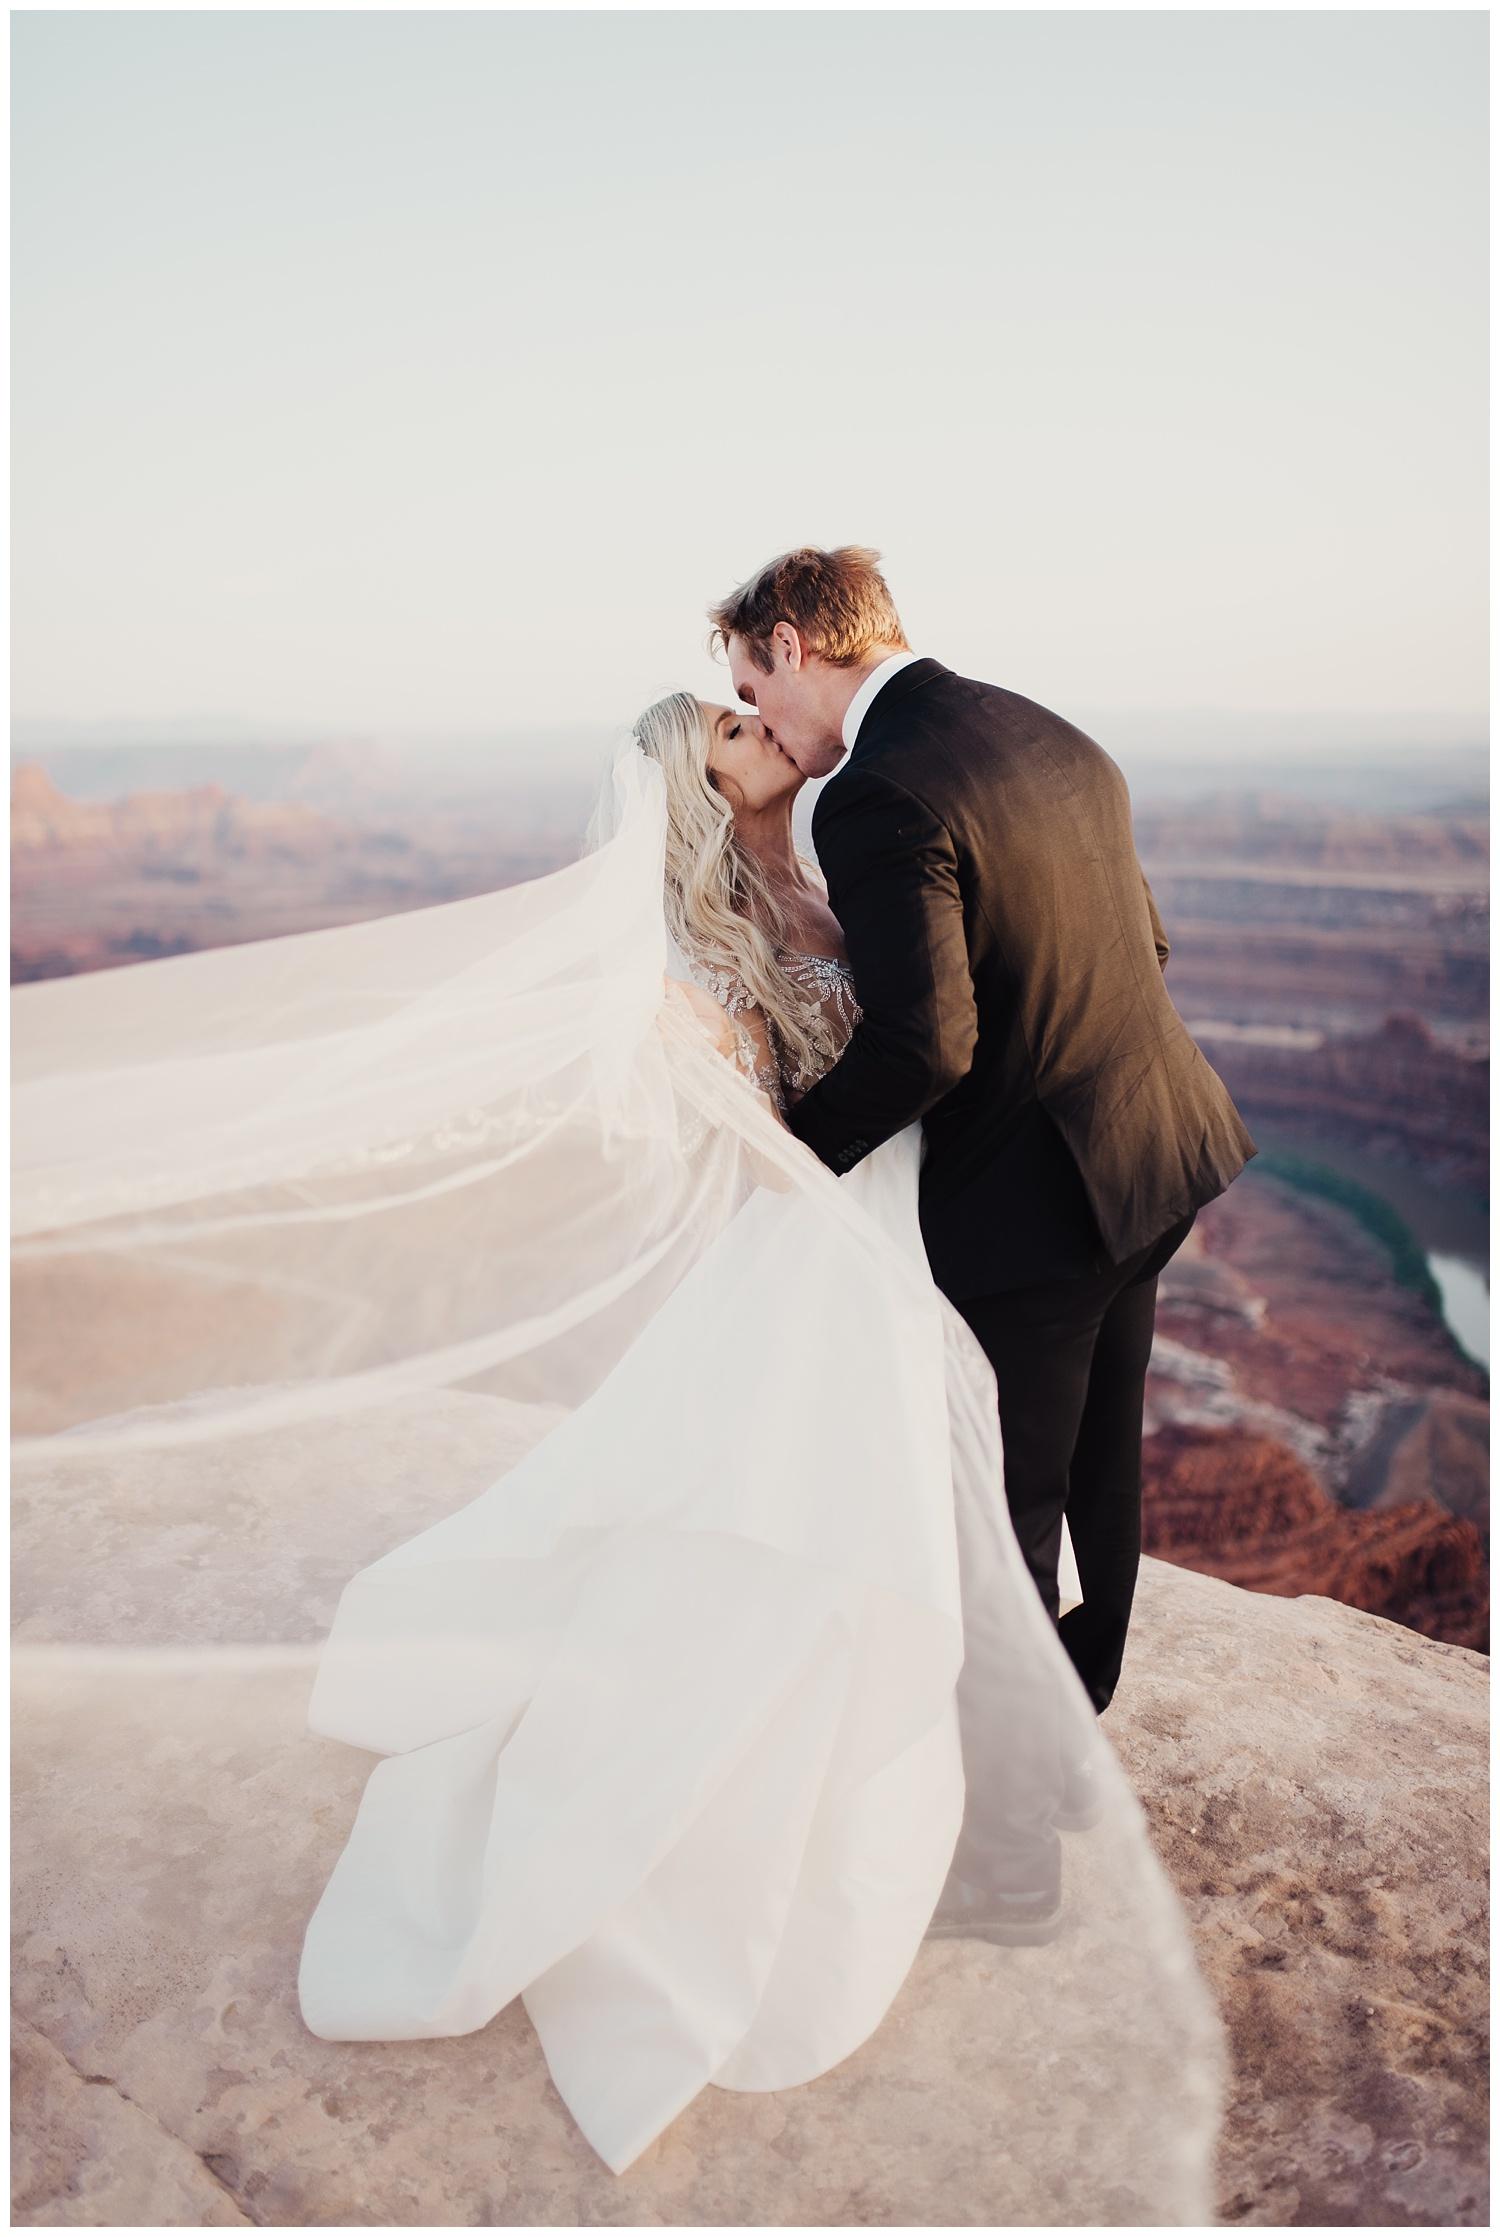 edenstraderphoto-weddingphotographer_0823.jpg